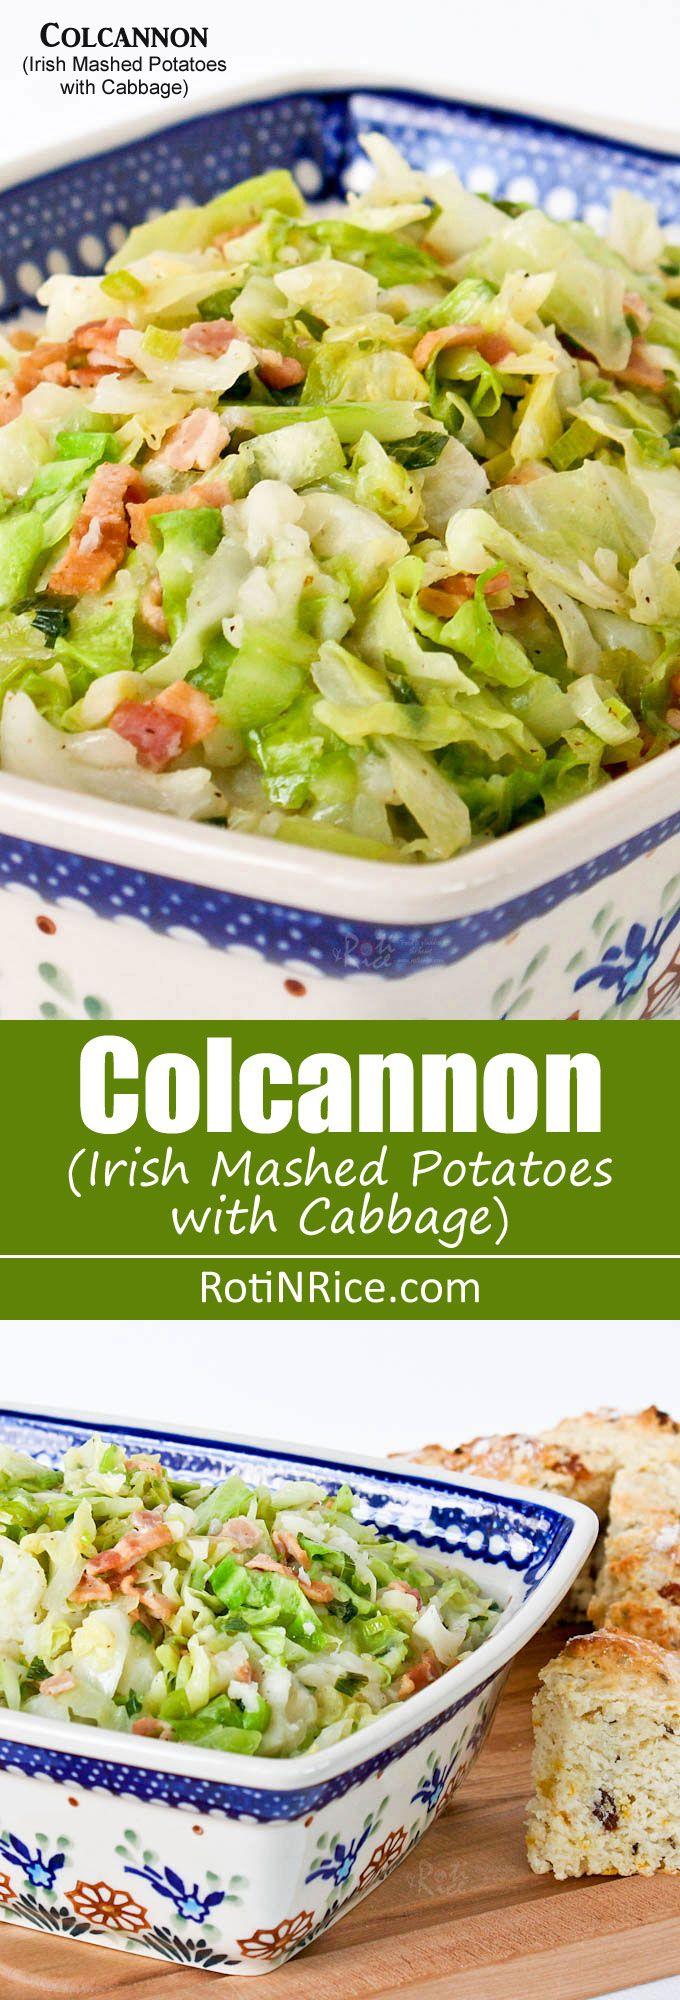 Colcannon Irish Mashed Potatoes With Cabbage Recipe